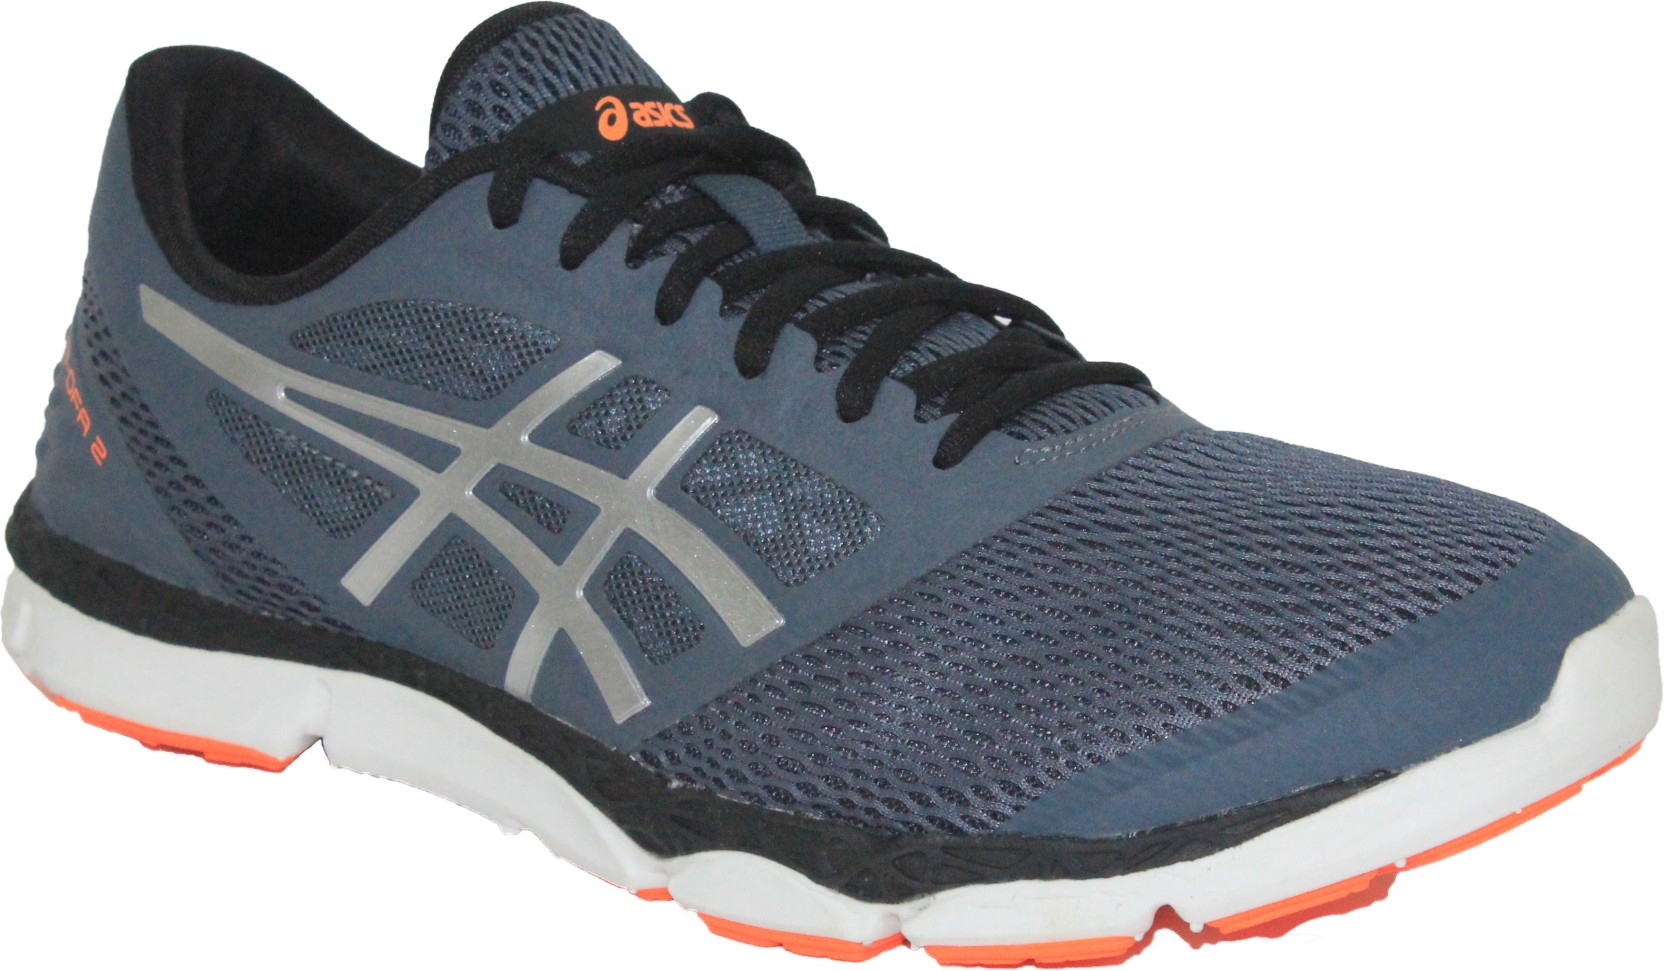 62a7d4df39b16 Asics 33-Dfa 2 Men Running Shoes For Men - Buy Dark Slate, Silver ...